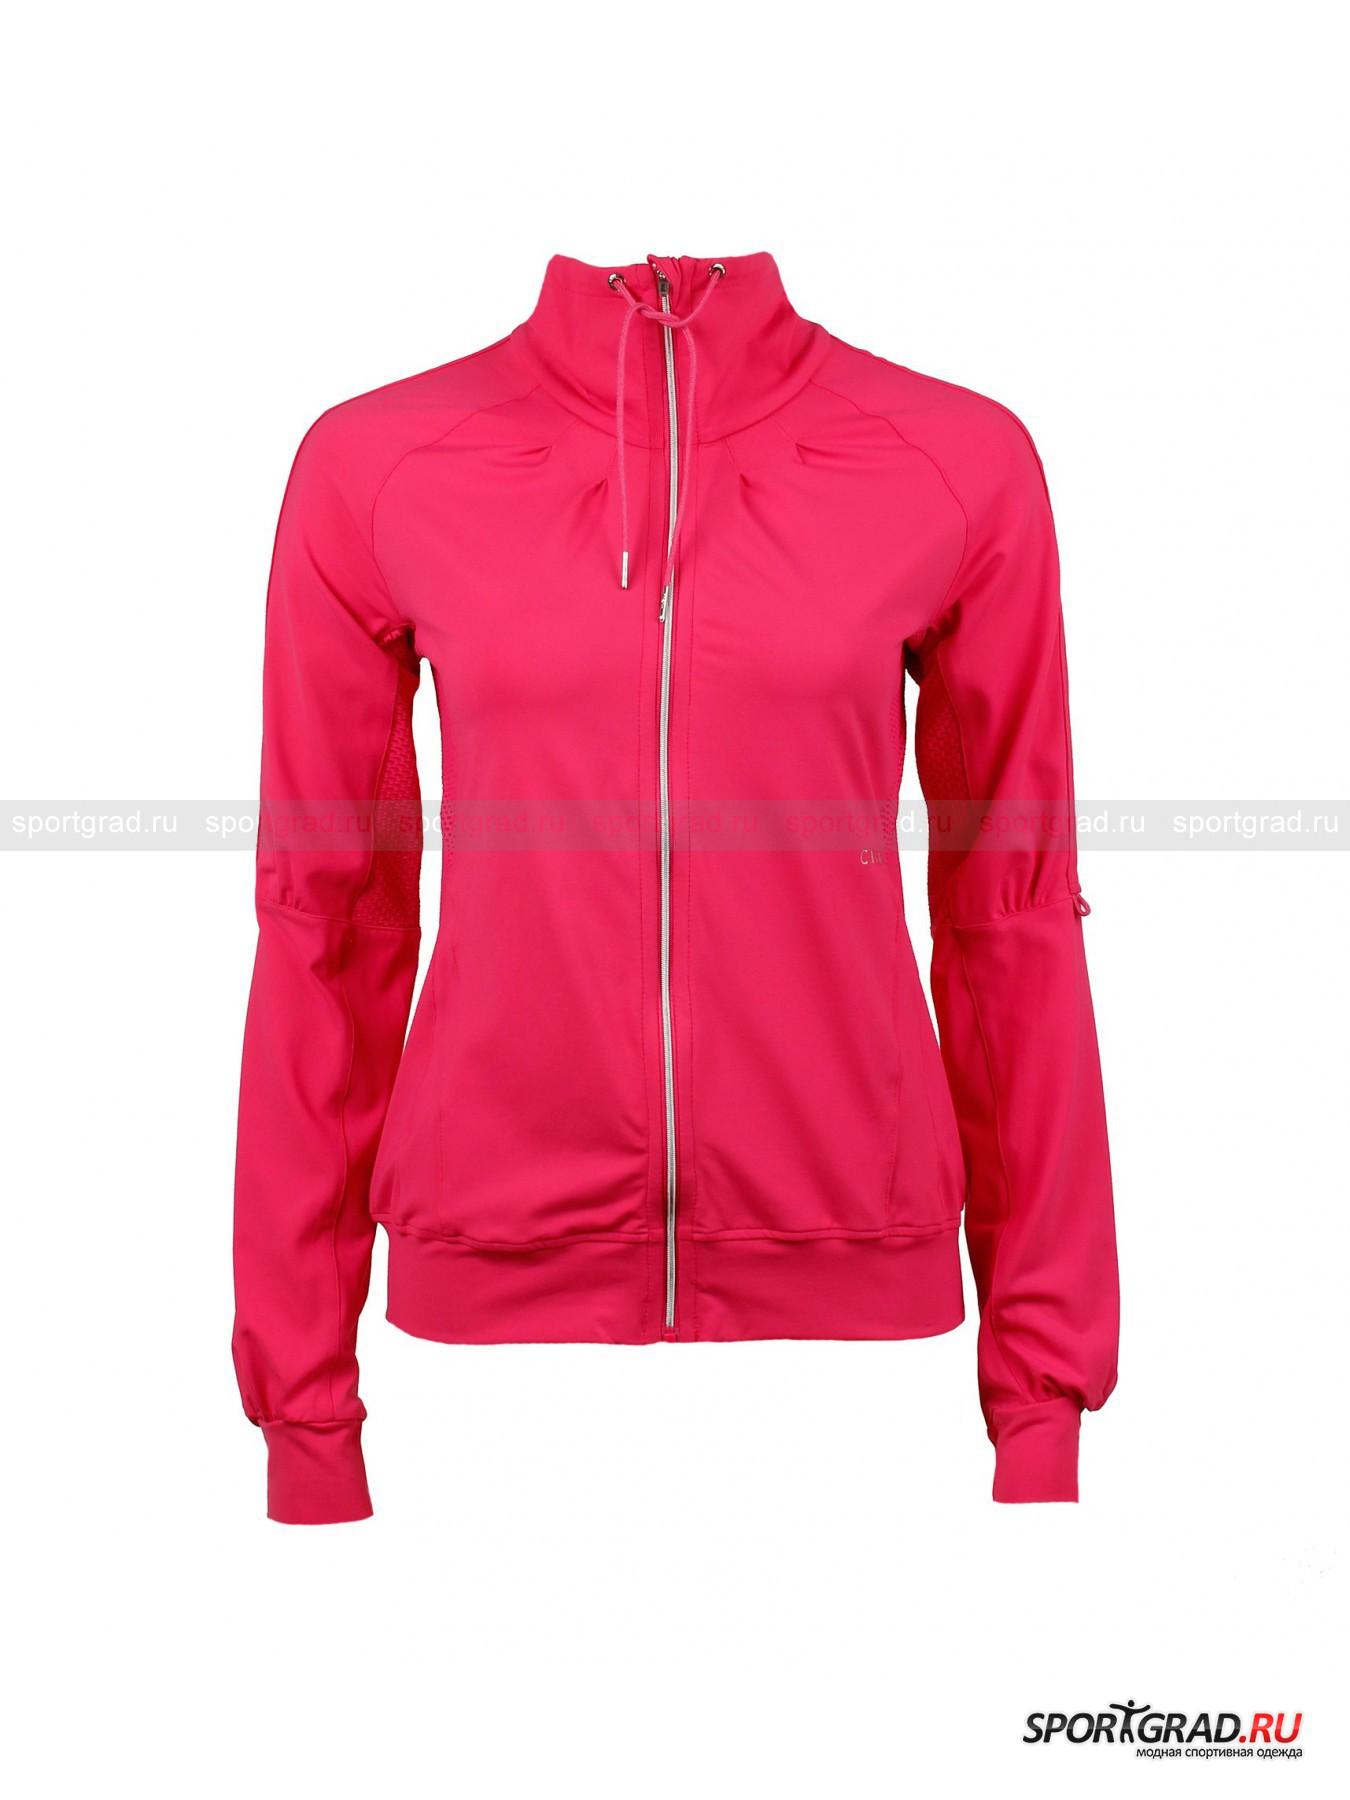 ��������� ������� Synergy jacket CASALL